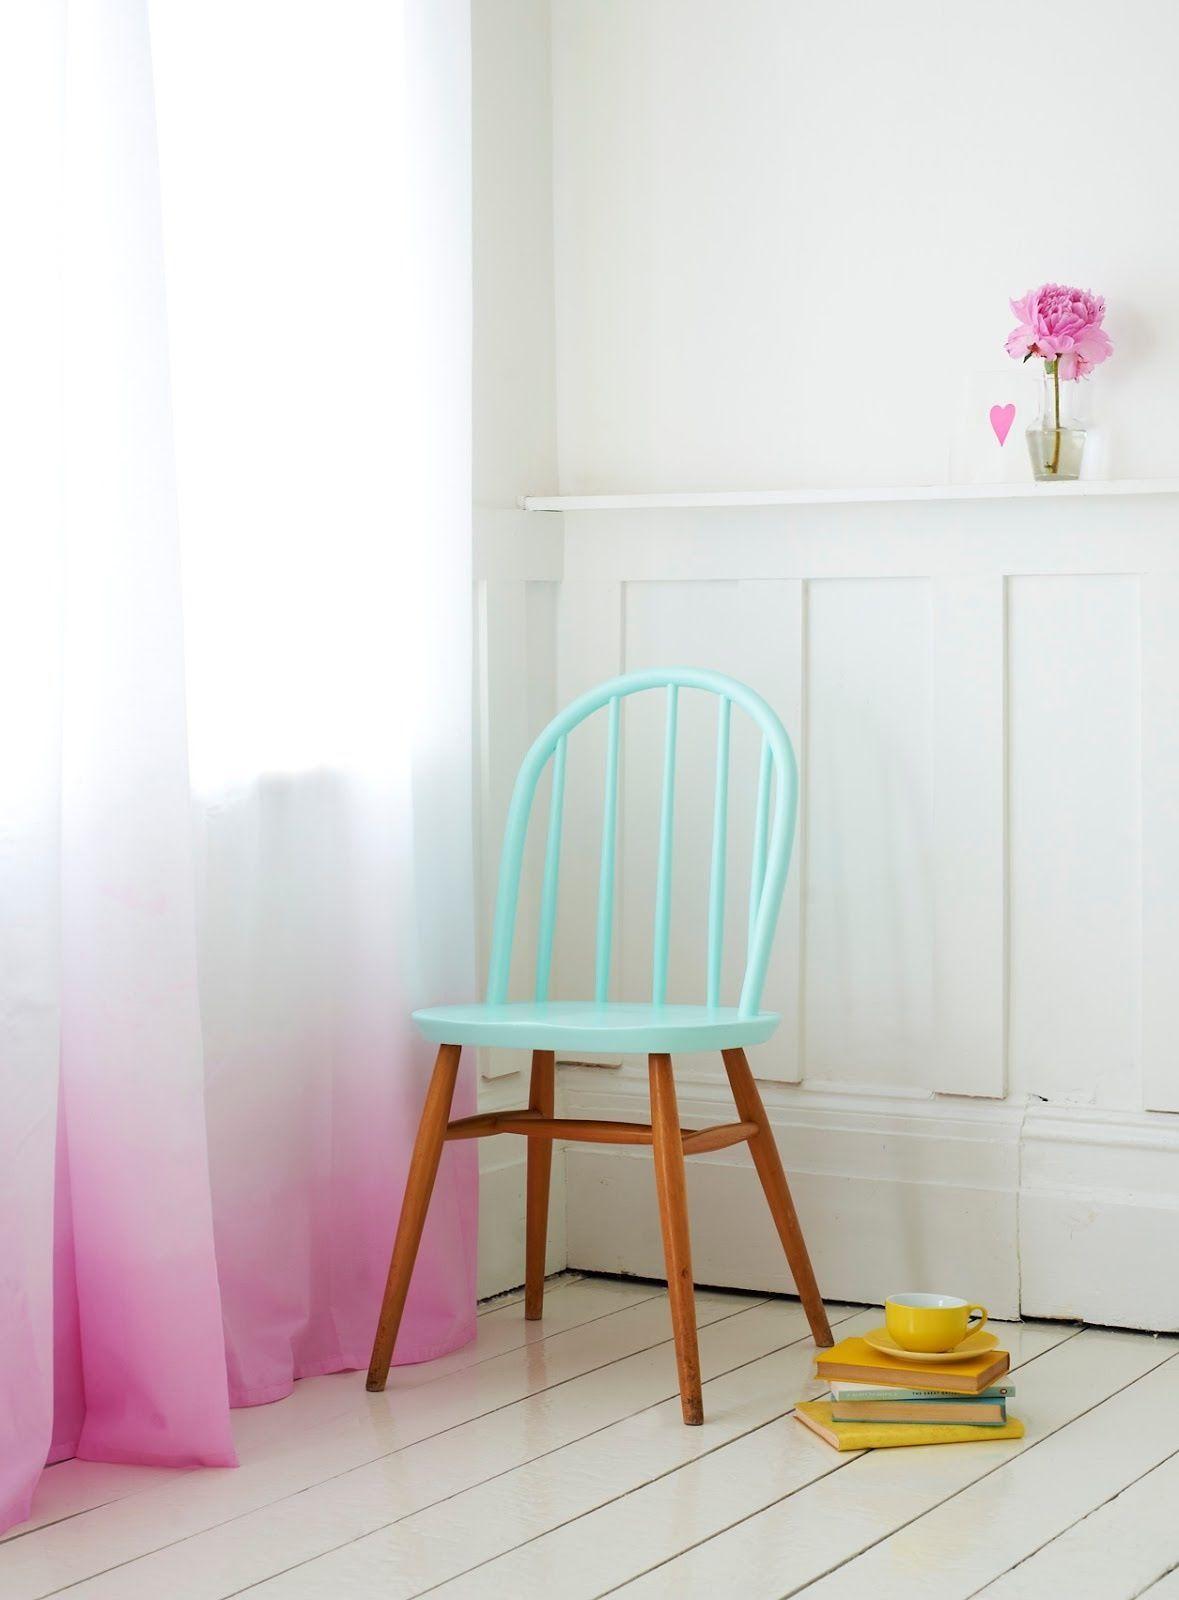 stoeltje van oma in fee haar kamertje en gele dip dye witte gordijnen